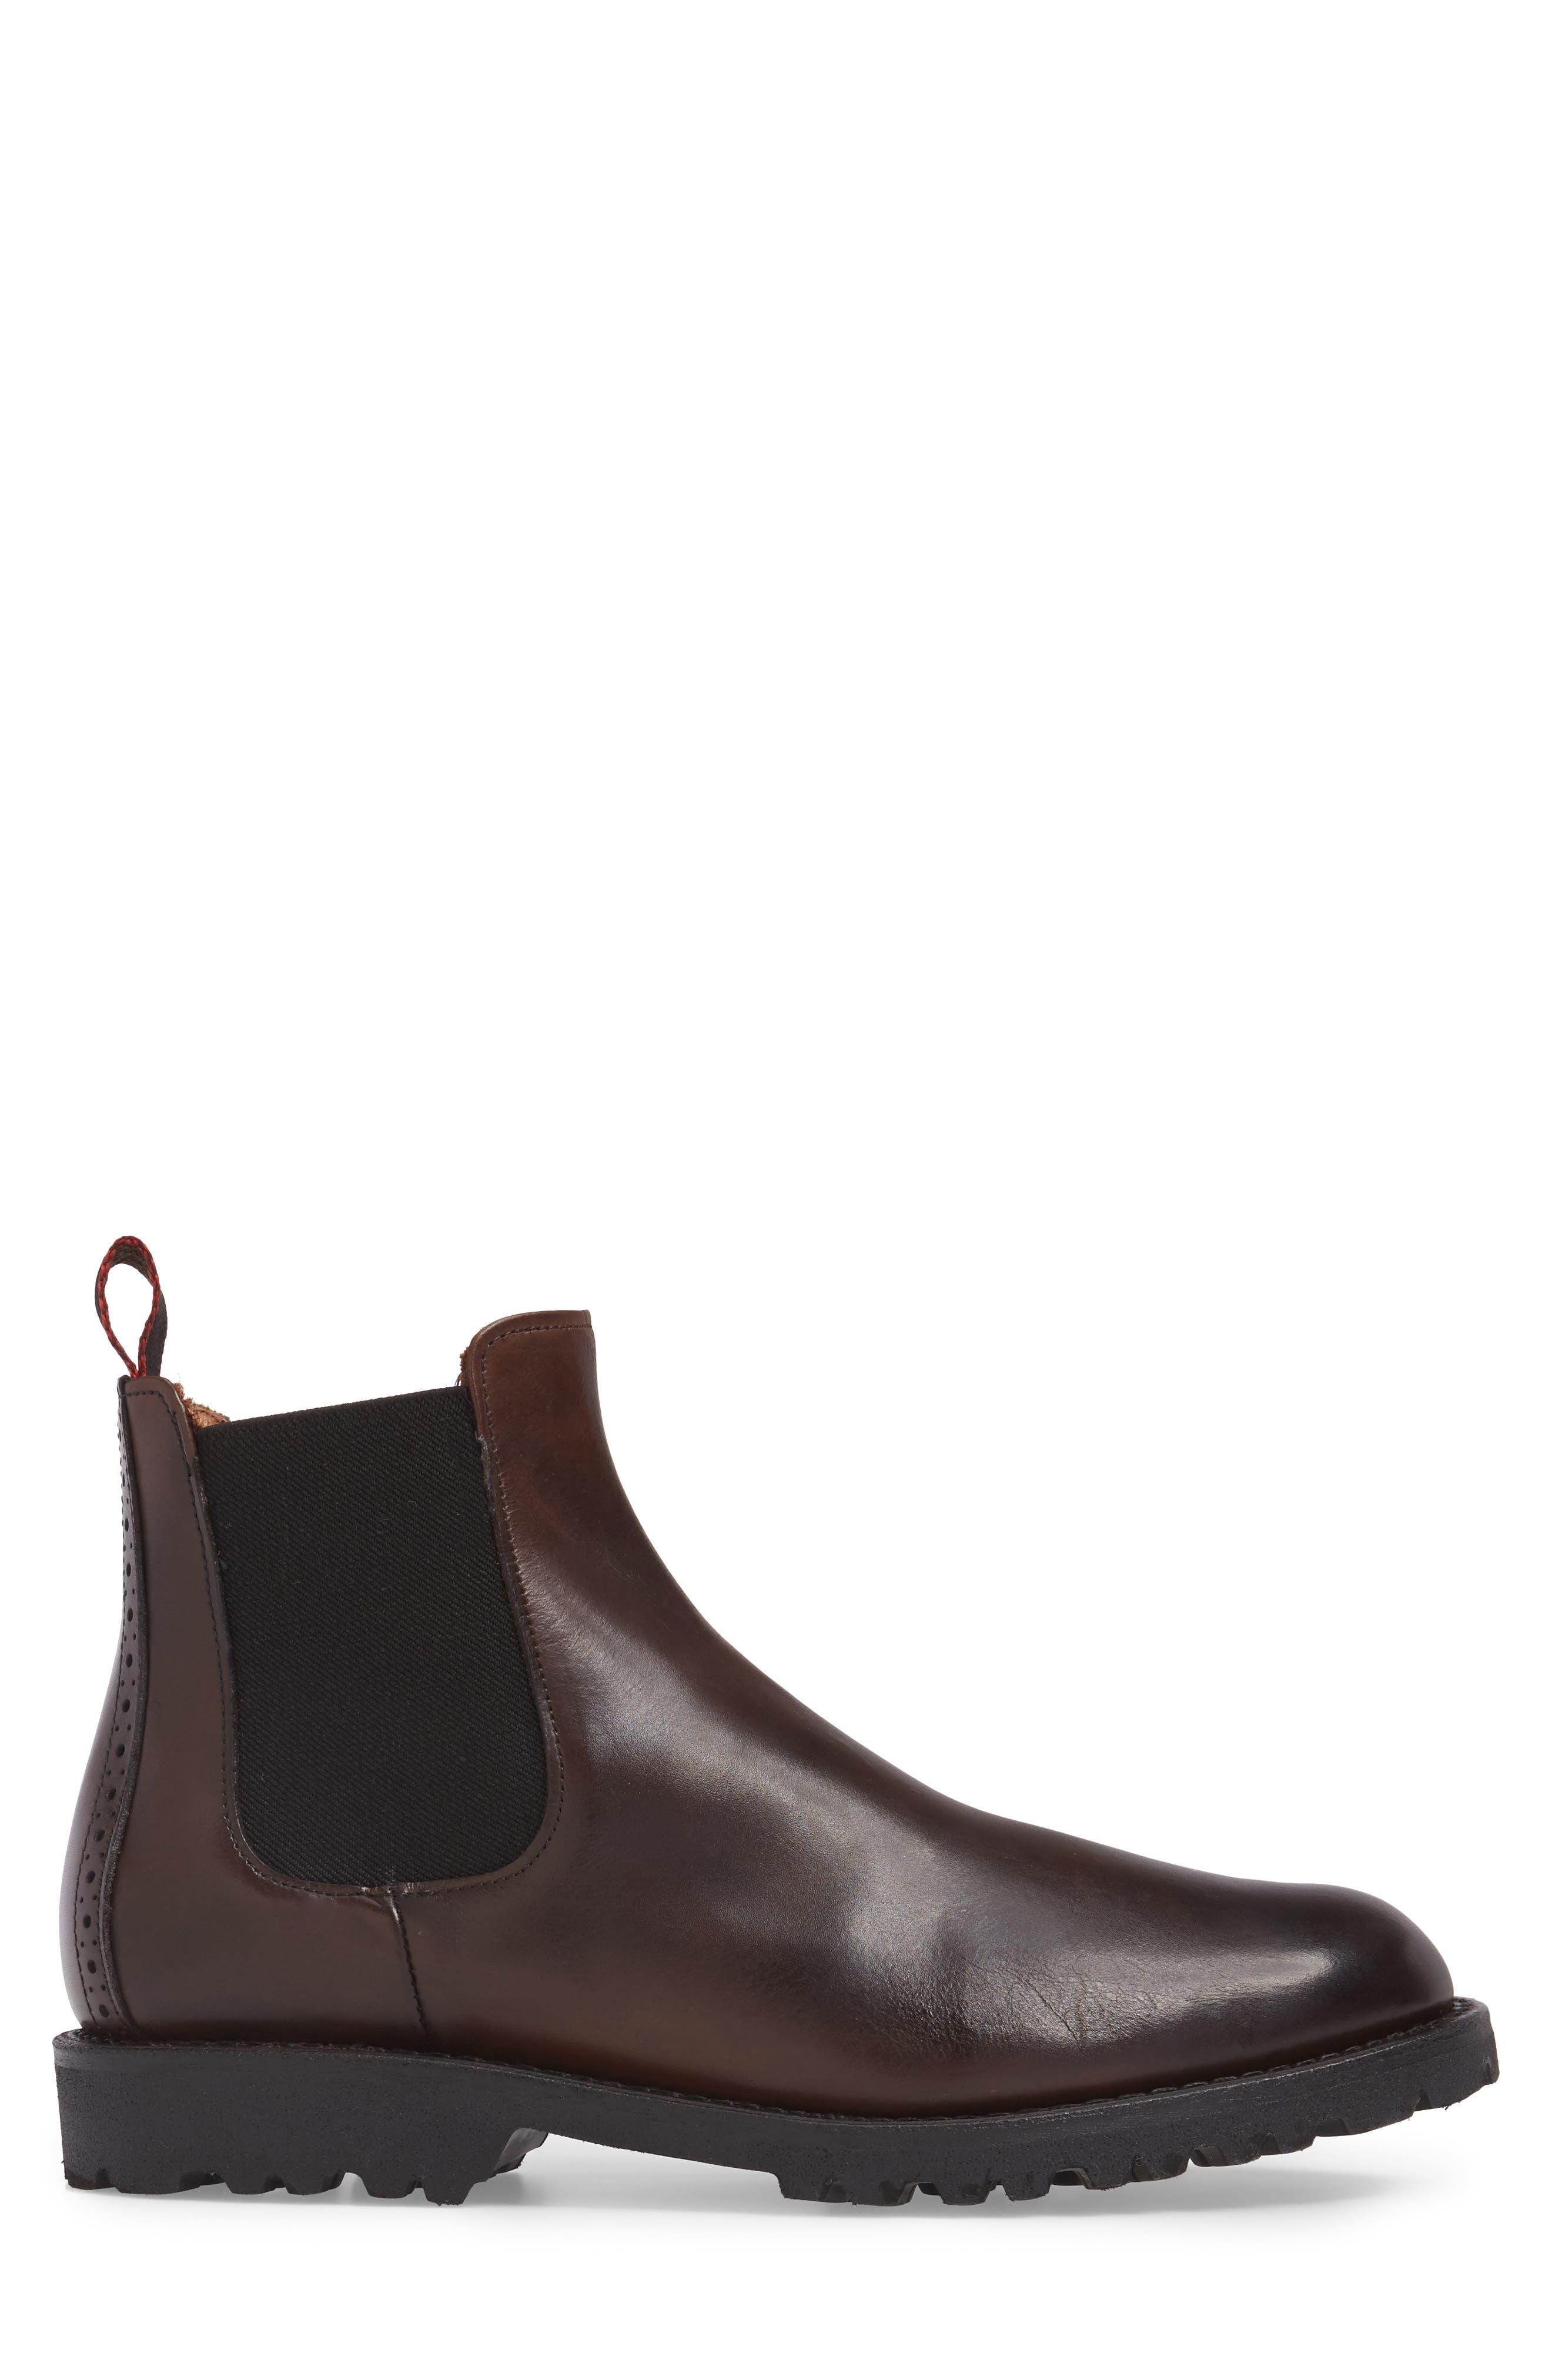 Alternate Image 3  - Allen Edmonds Tate Chelsea Boot (Men)